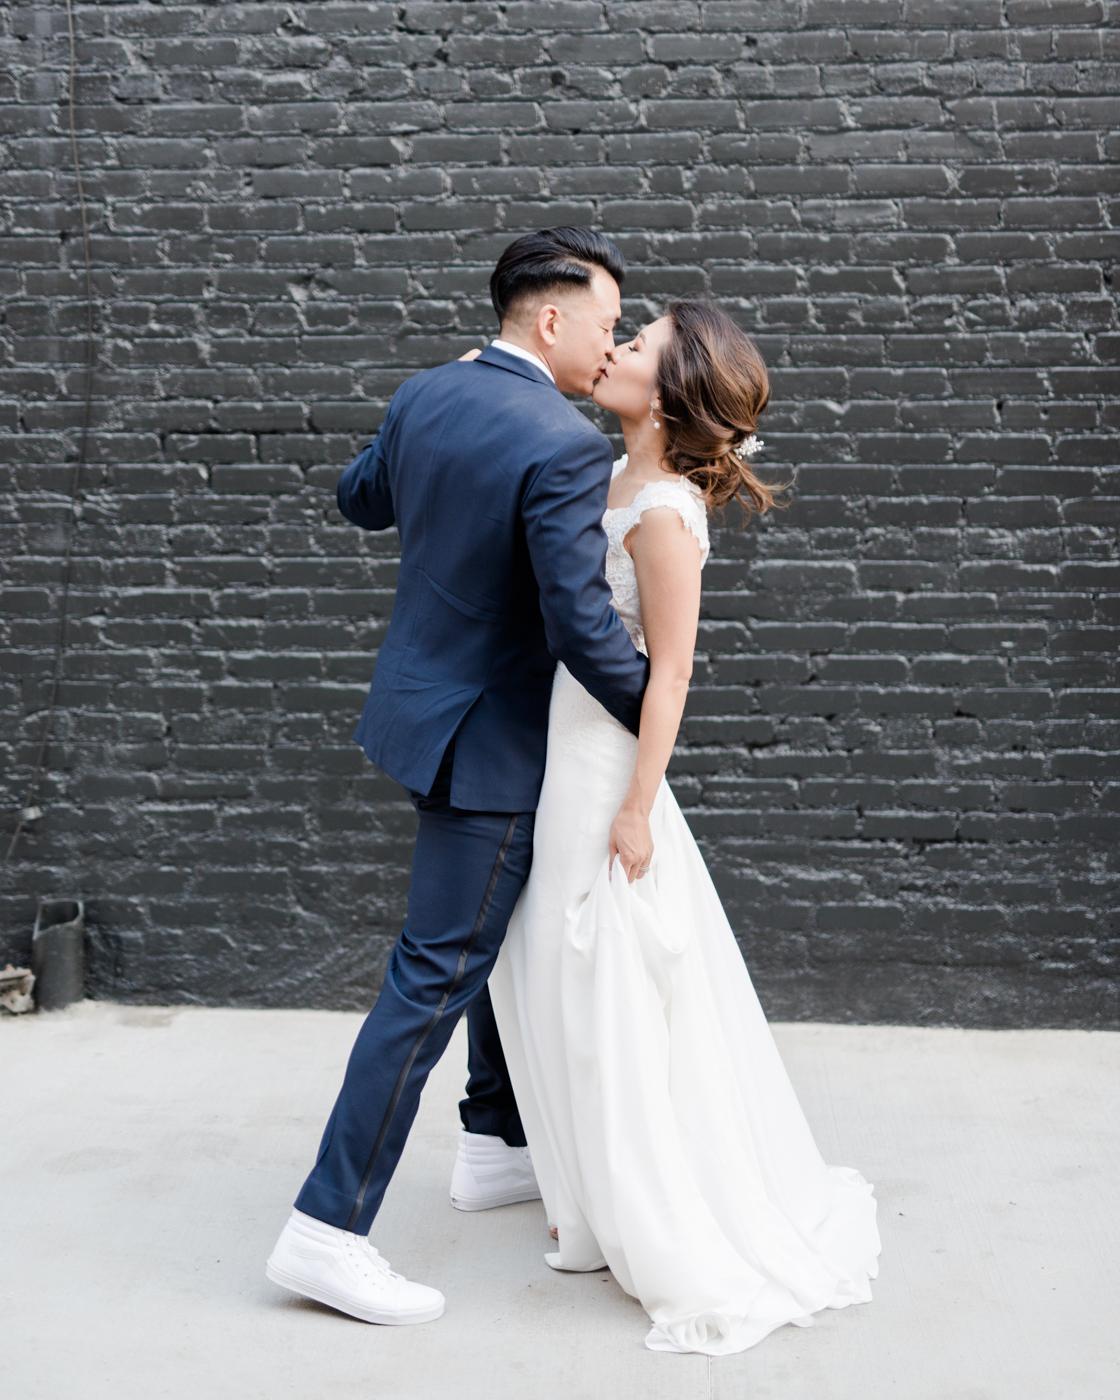 Modern_Wedding_HNYPT_Honeypot_LA_Photographer_Los_Angeles-36.jpg